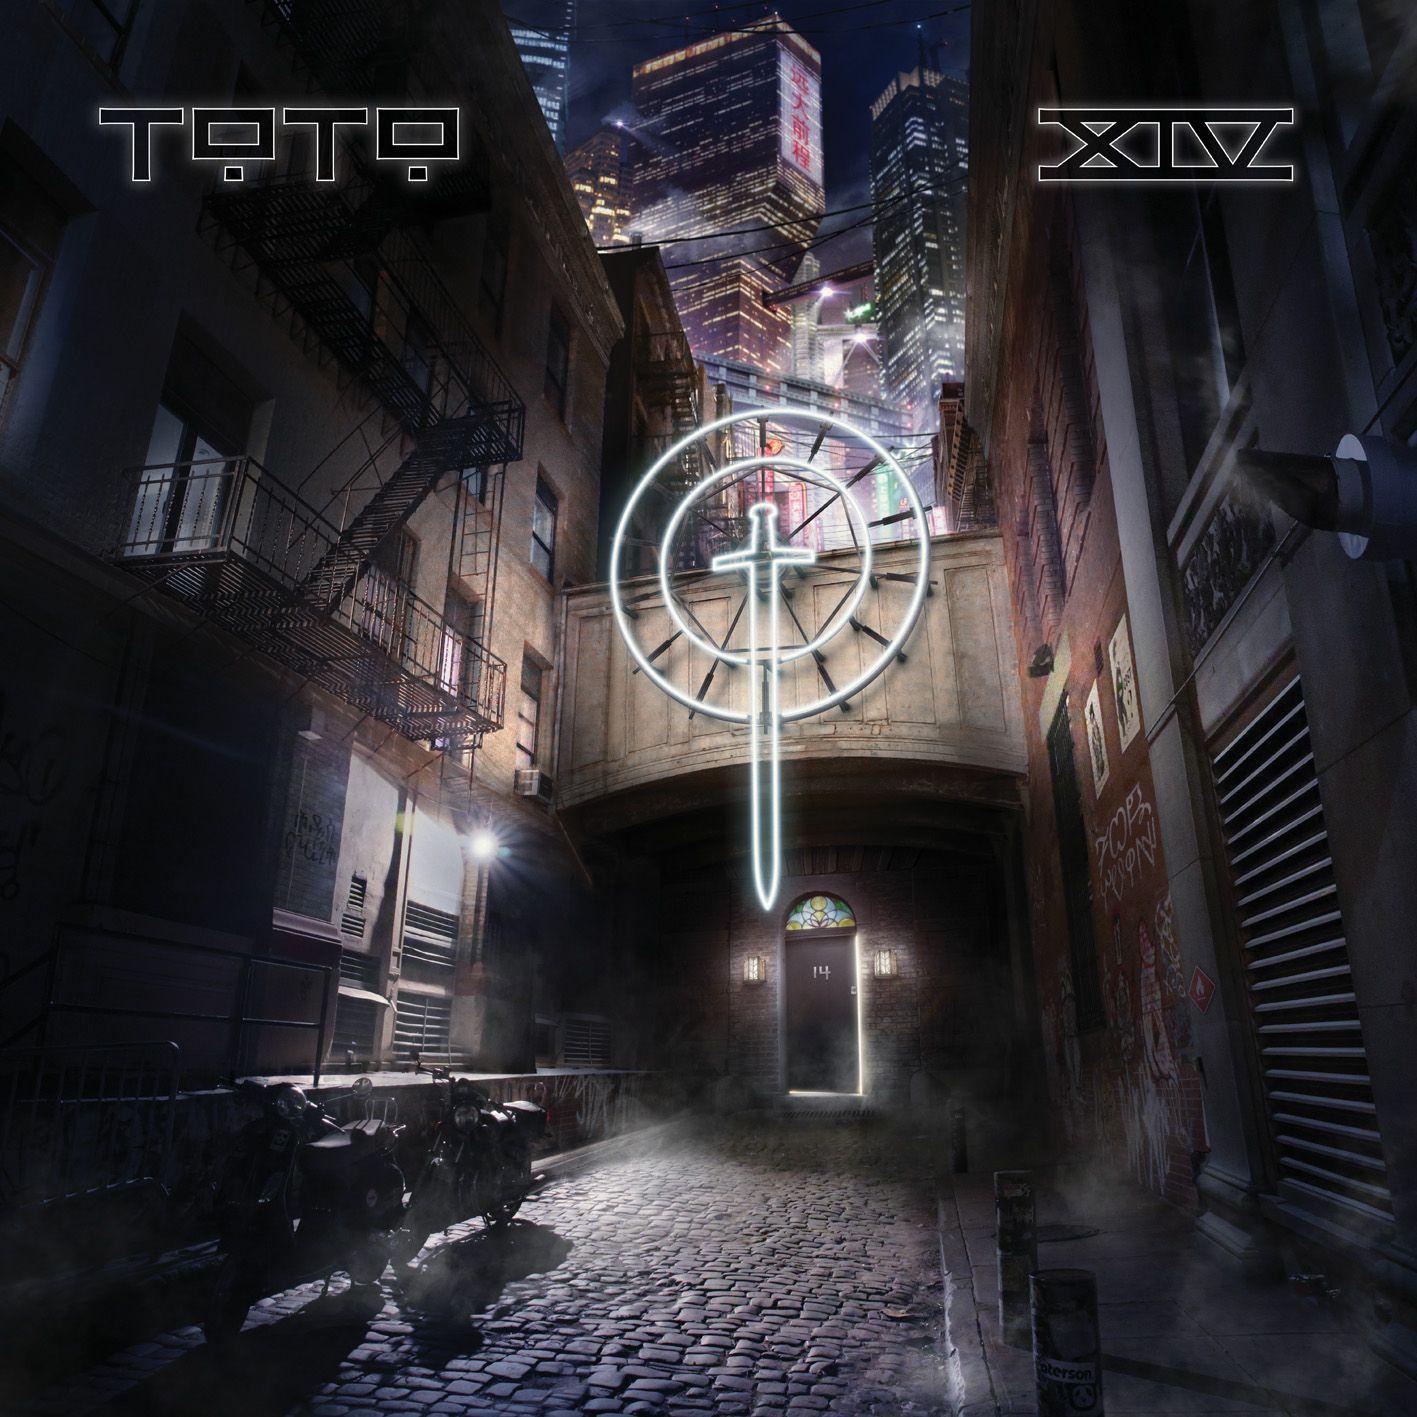 Toto - XIV album cover